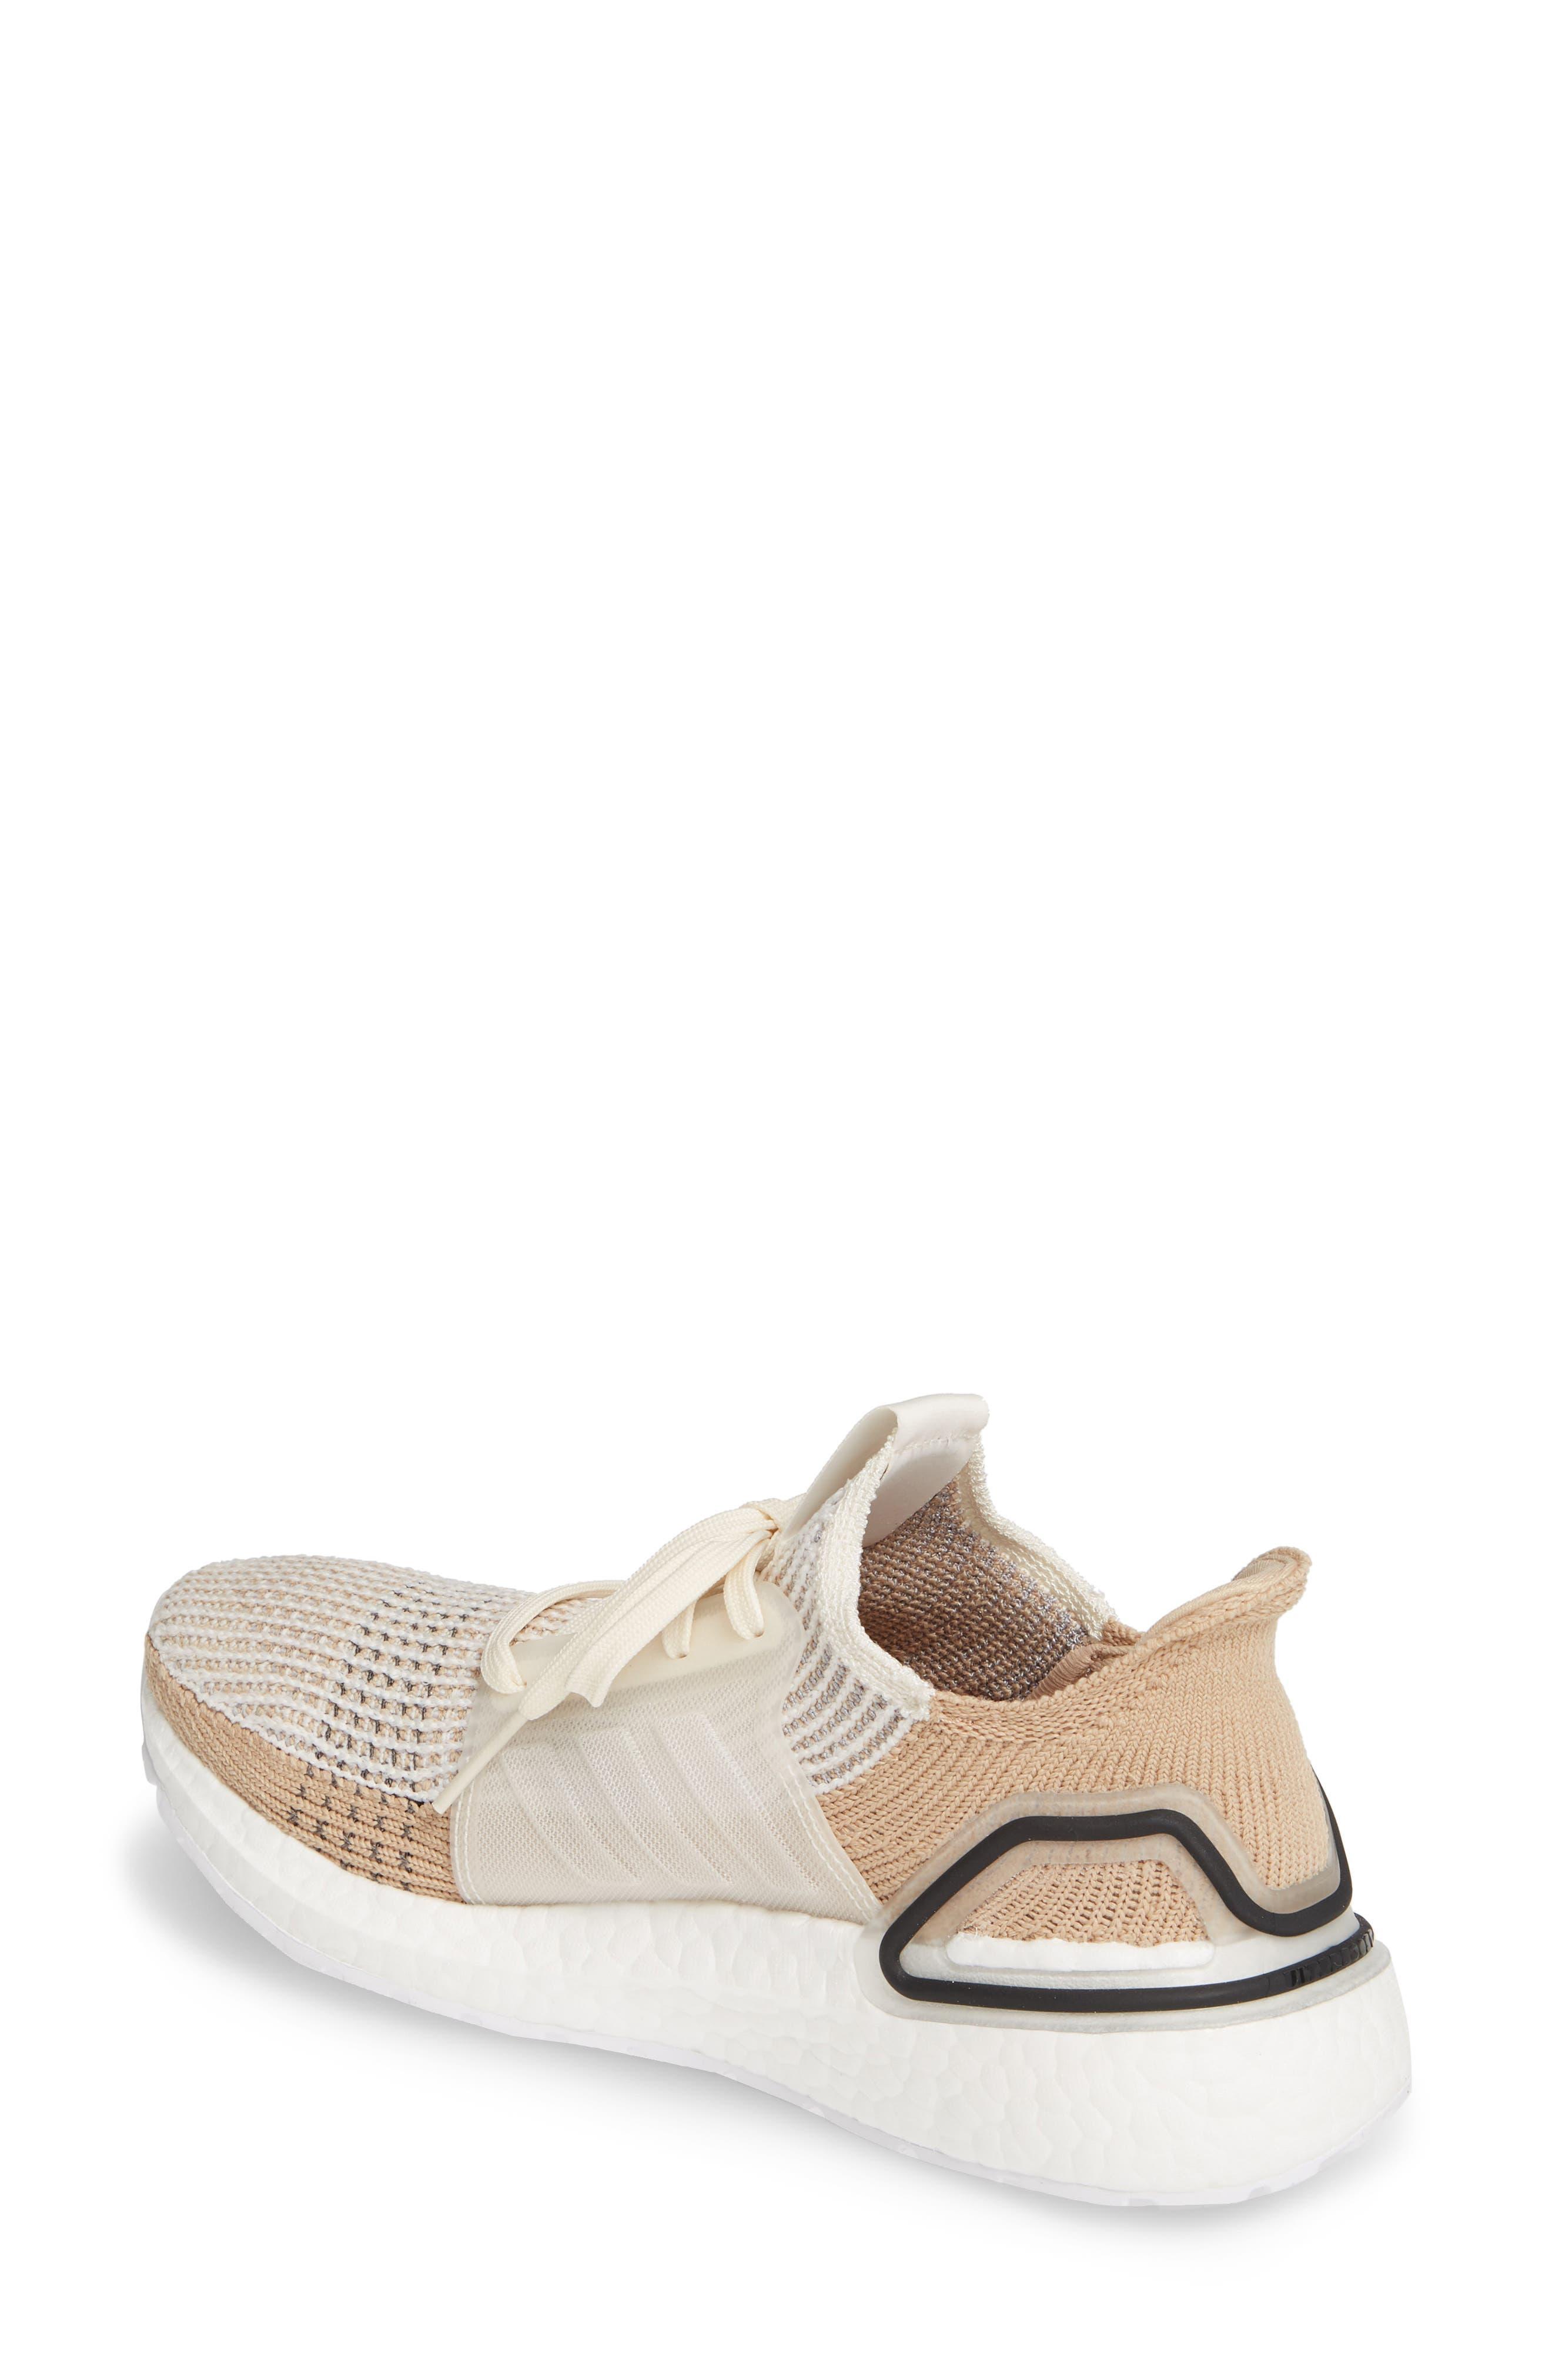 ADIDAS, UltraBoost 19 Running Shoe, Alternate thumbnail 2, color, CHALK WHITE/ PALE NUDE/ BLACK